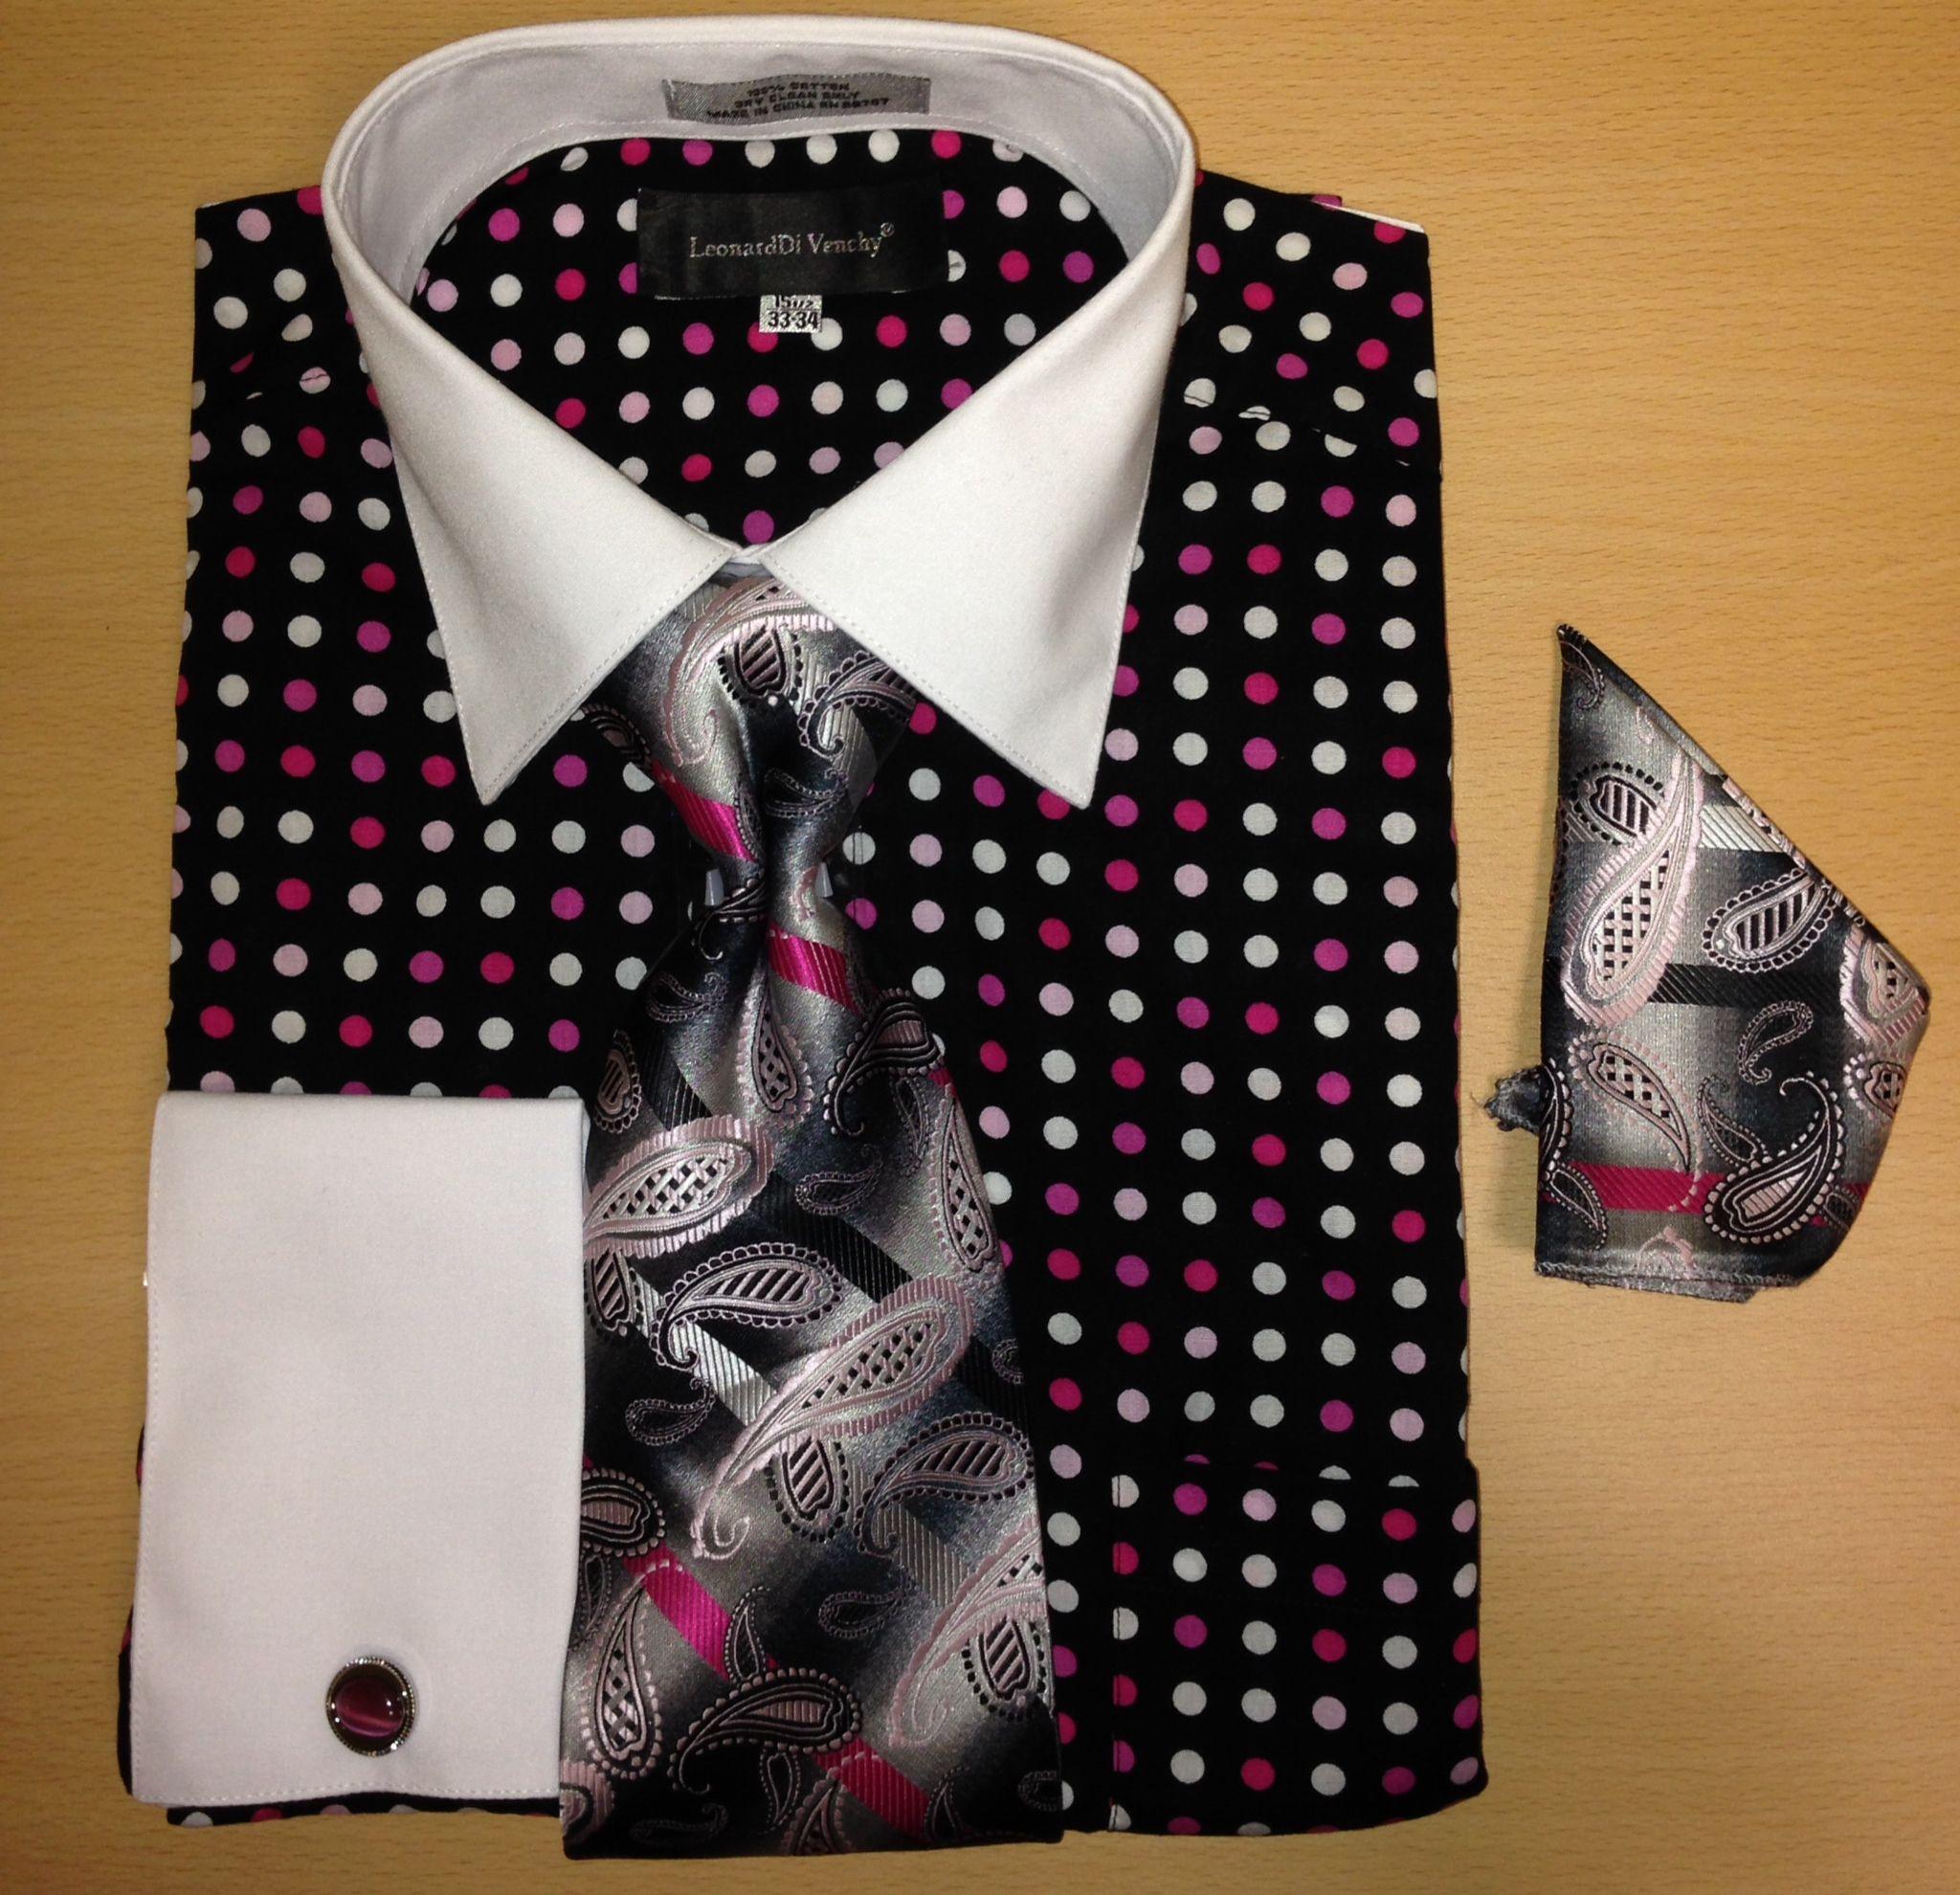 Men's Fashion Multi Xtreme Polka Dot Cufflink Dress Shirt Set - Black and Pink